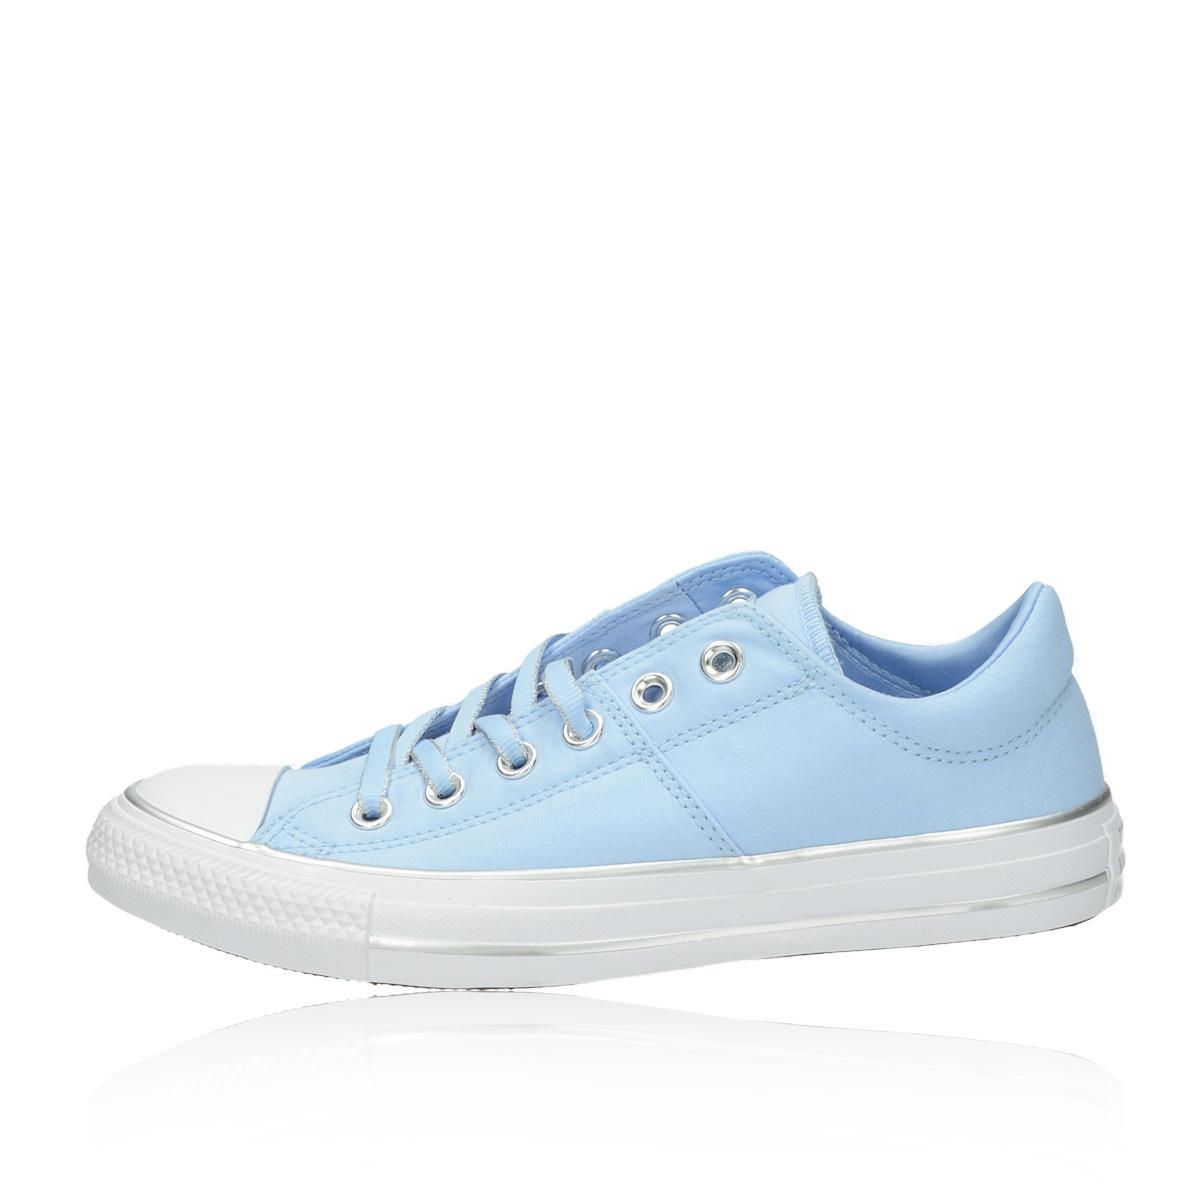 Converse dámske textilné tenisky - modré Converse dámske textilné tenisky -  modré ... c5d353864e4